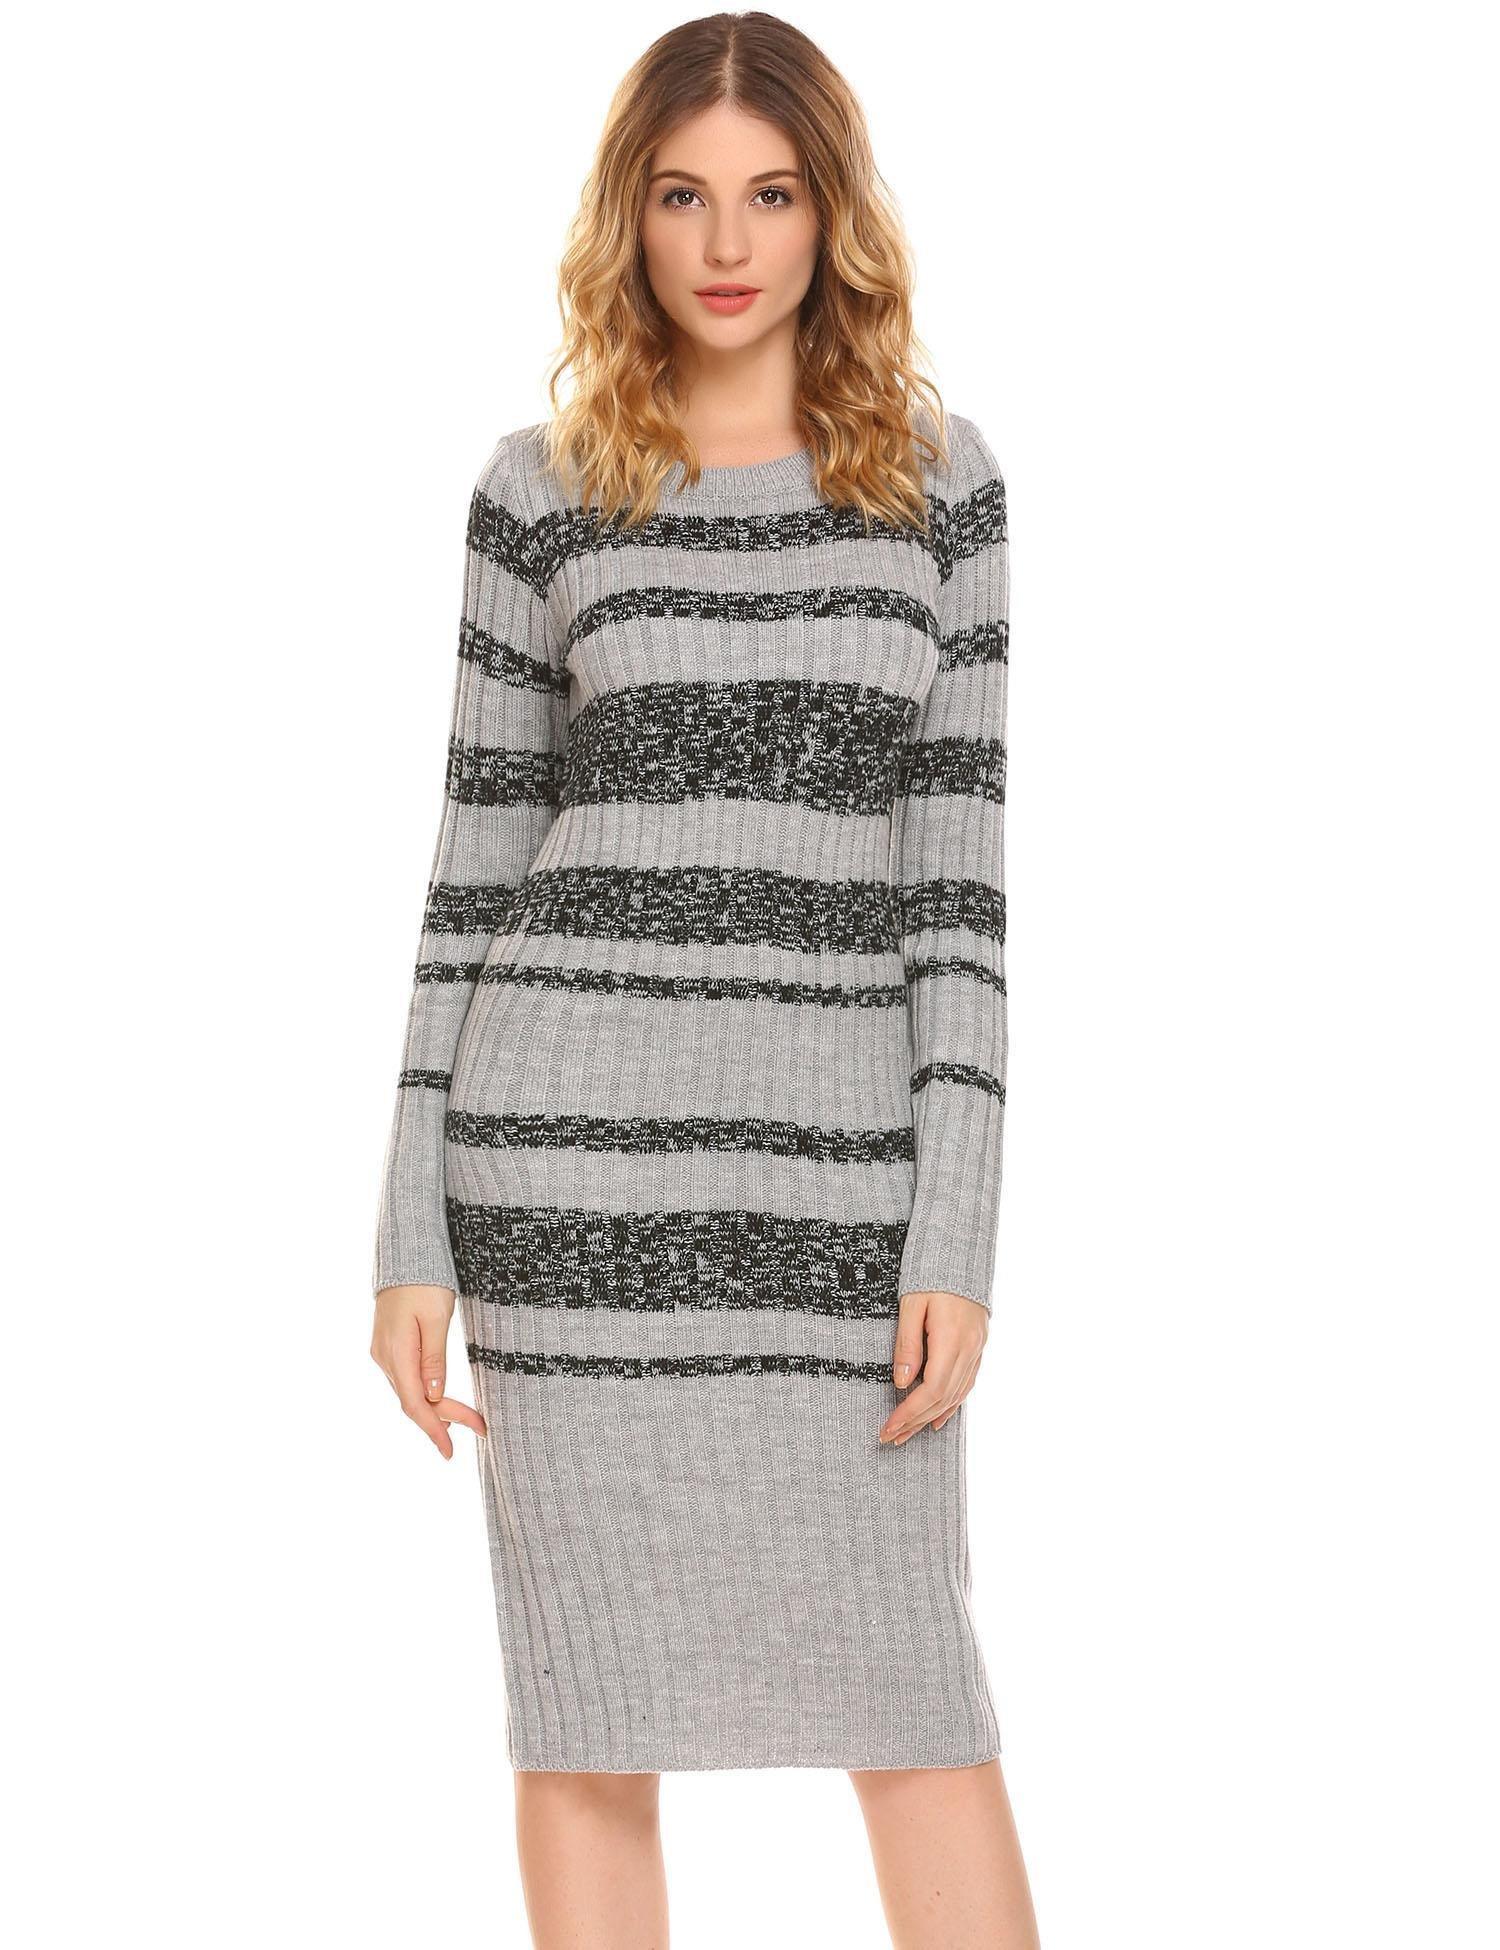 Women Long Sleeve Striped Slim Fit Cotton Knit Knee Length Pullover Sweater Dress,Grey,Medium